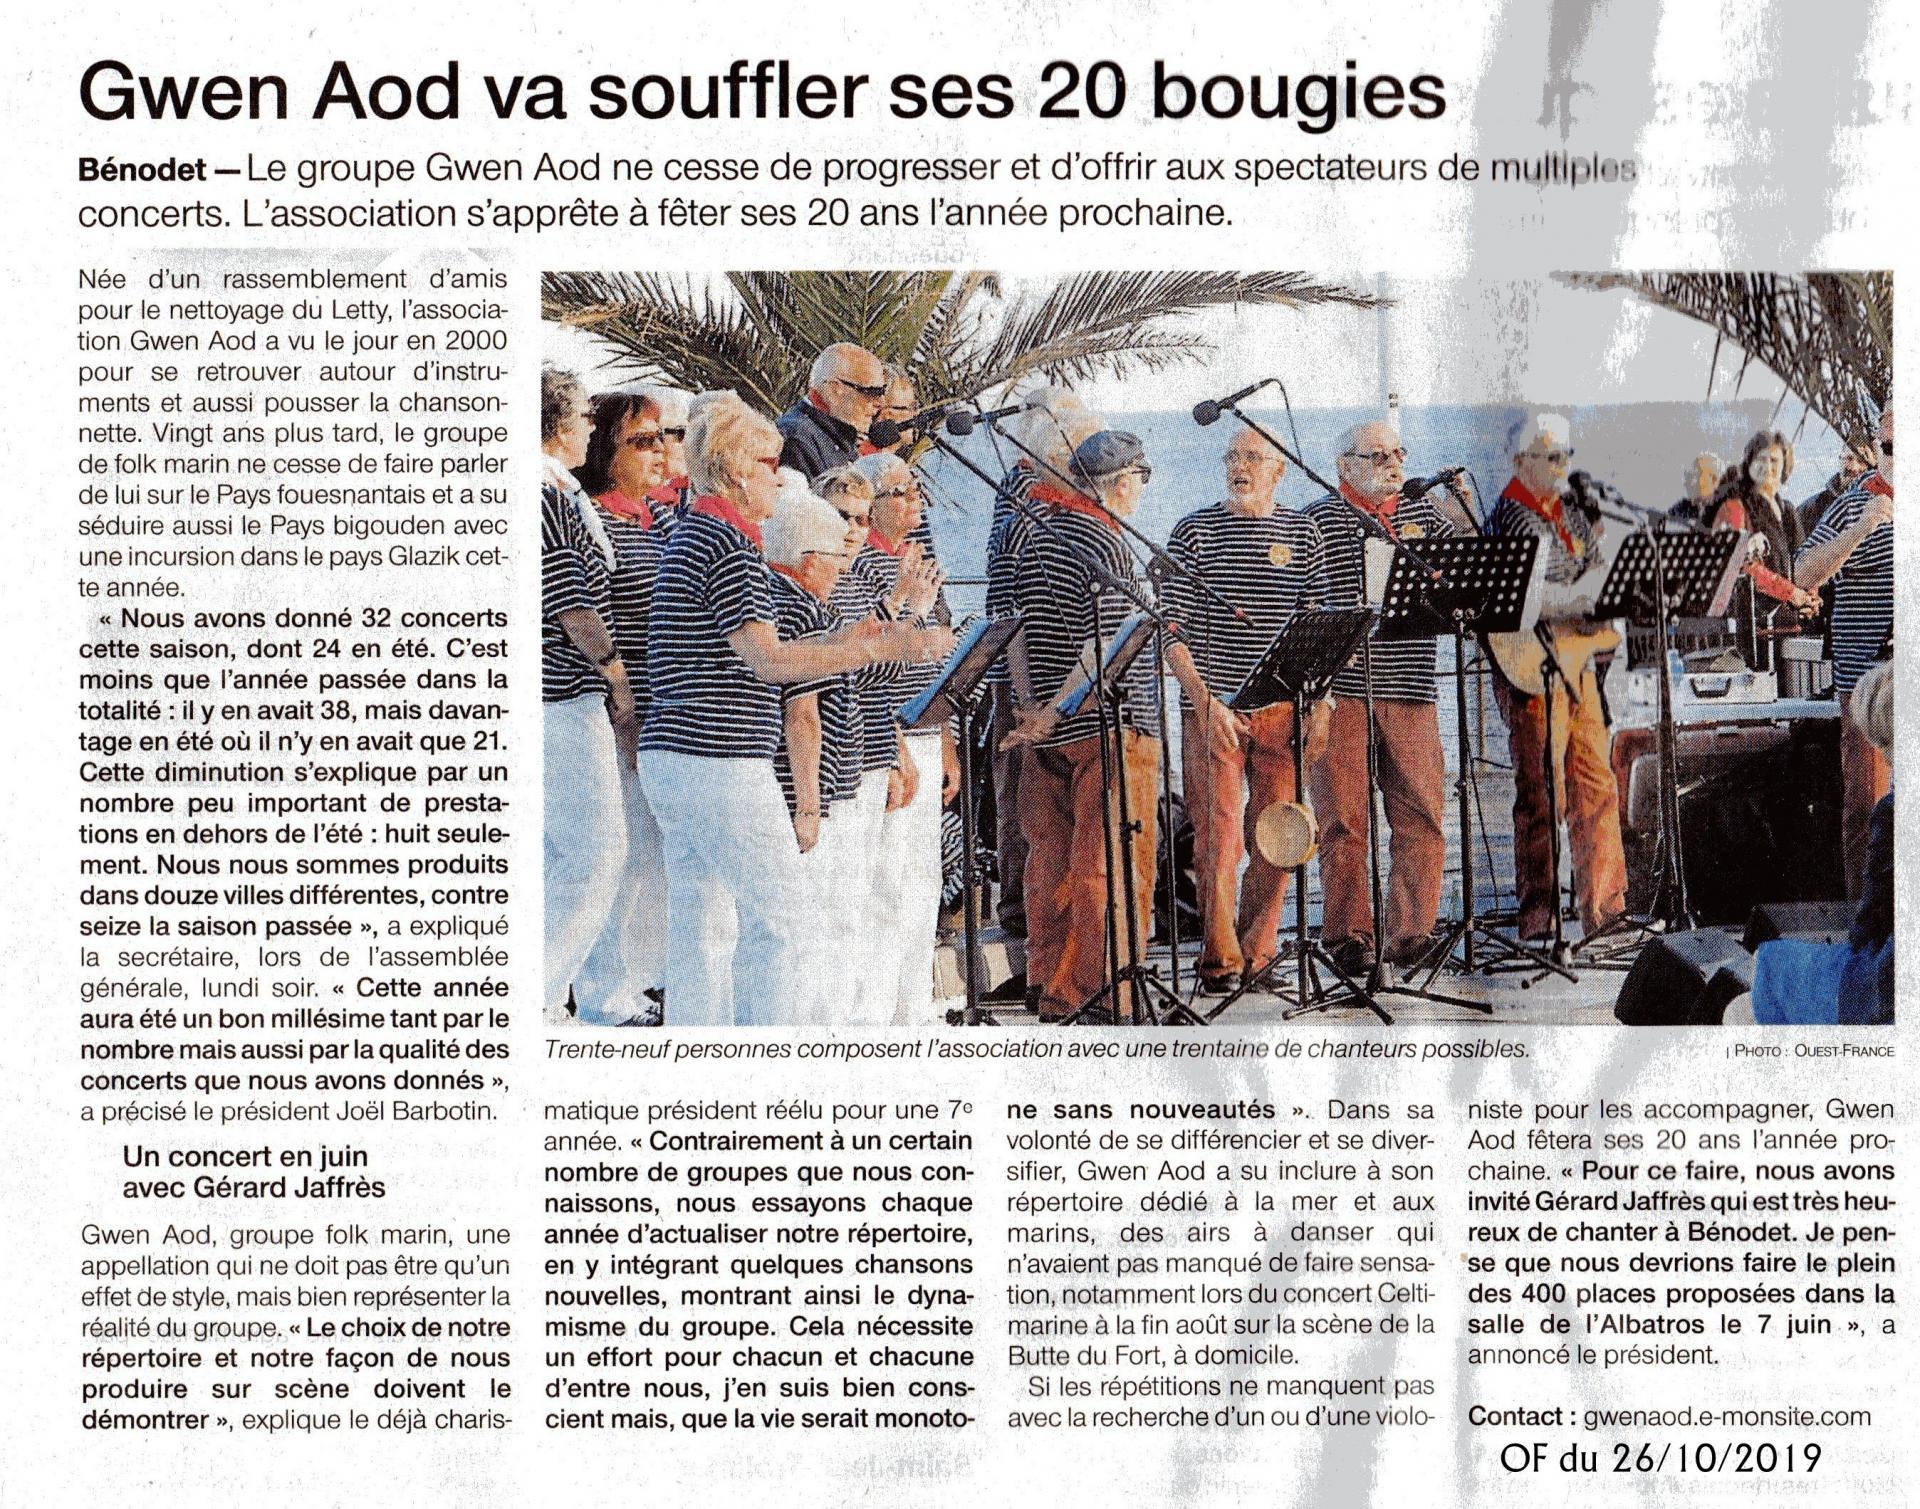 GA Ouest-France 26 10 19